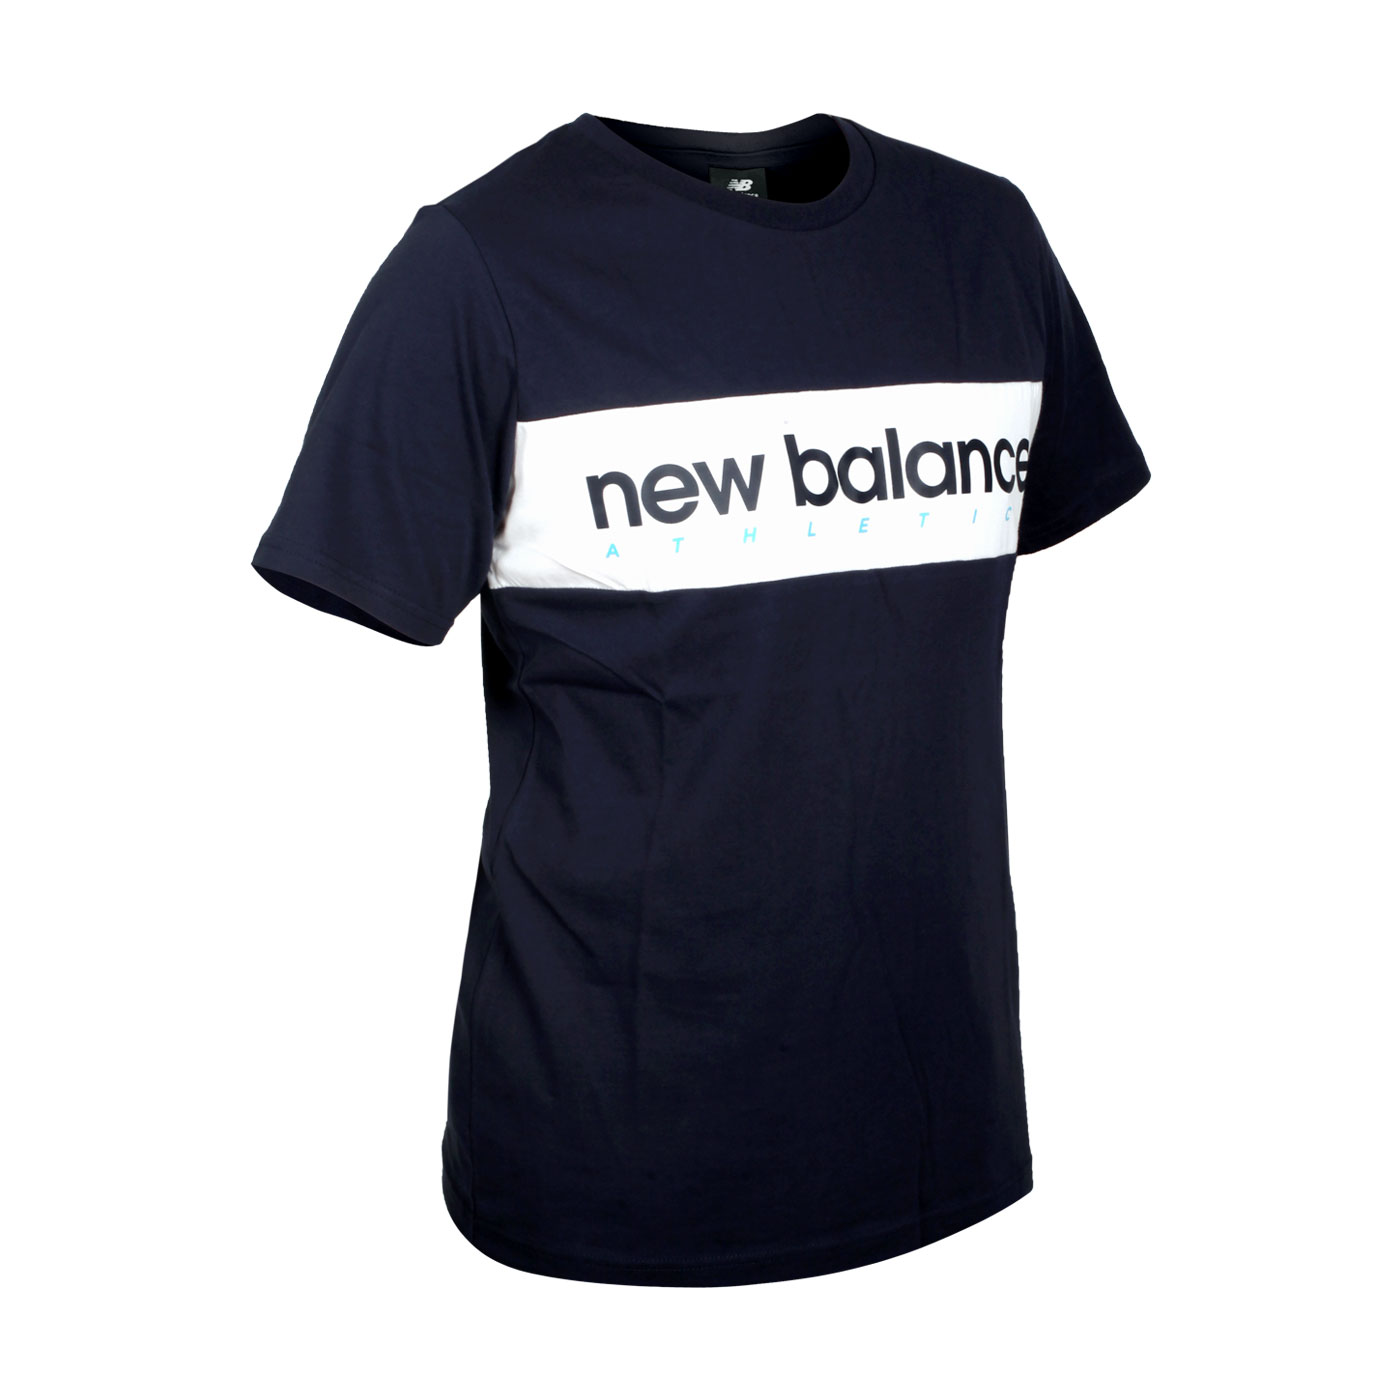 NEW BALANCE 男款橫條品牌短袖T恤 AMT11548ECL - 丈青白藍